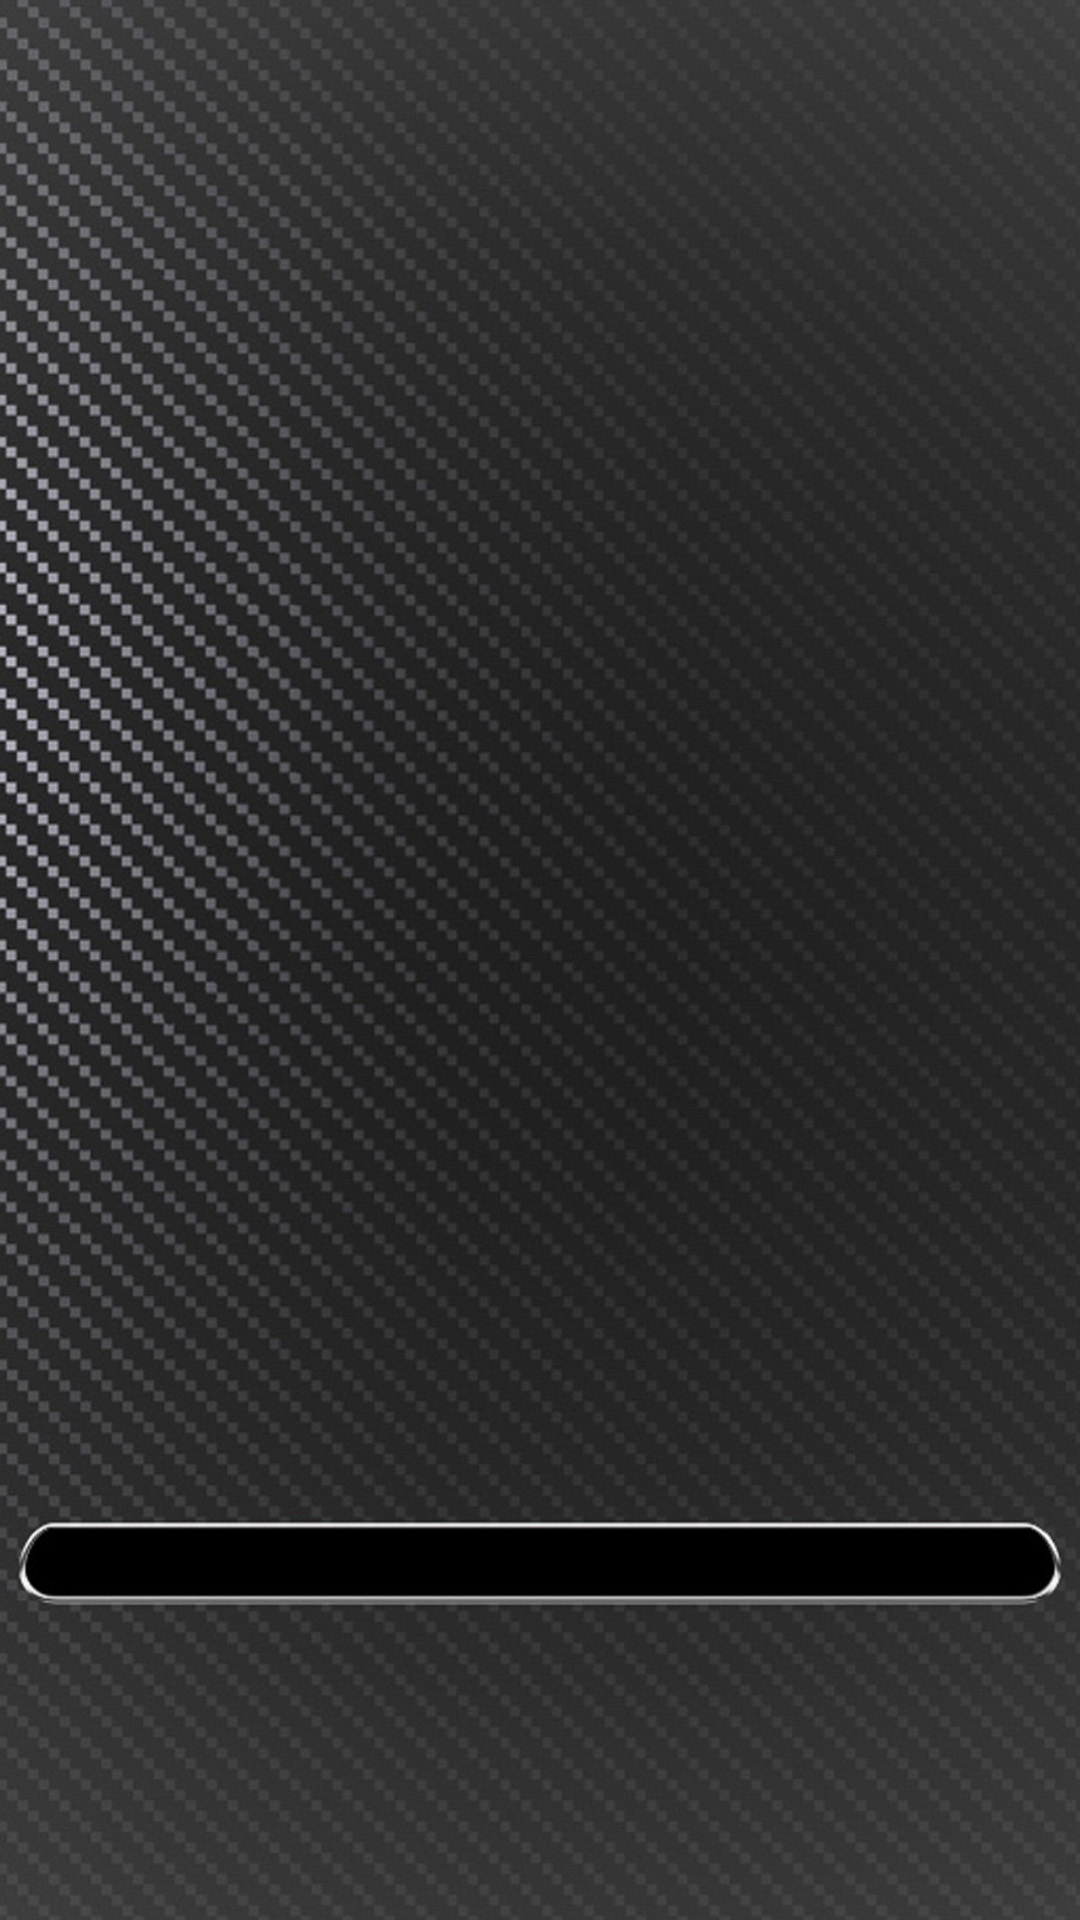 Download Texture Carbon Fiber Wallpapers 1600x1200 Best Wallpaper 1080x1920